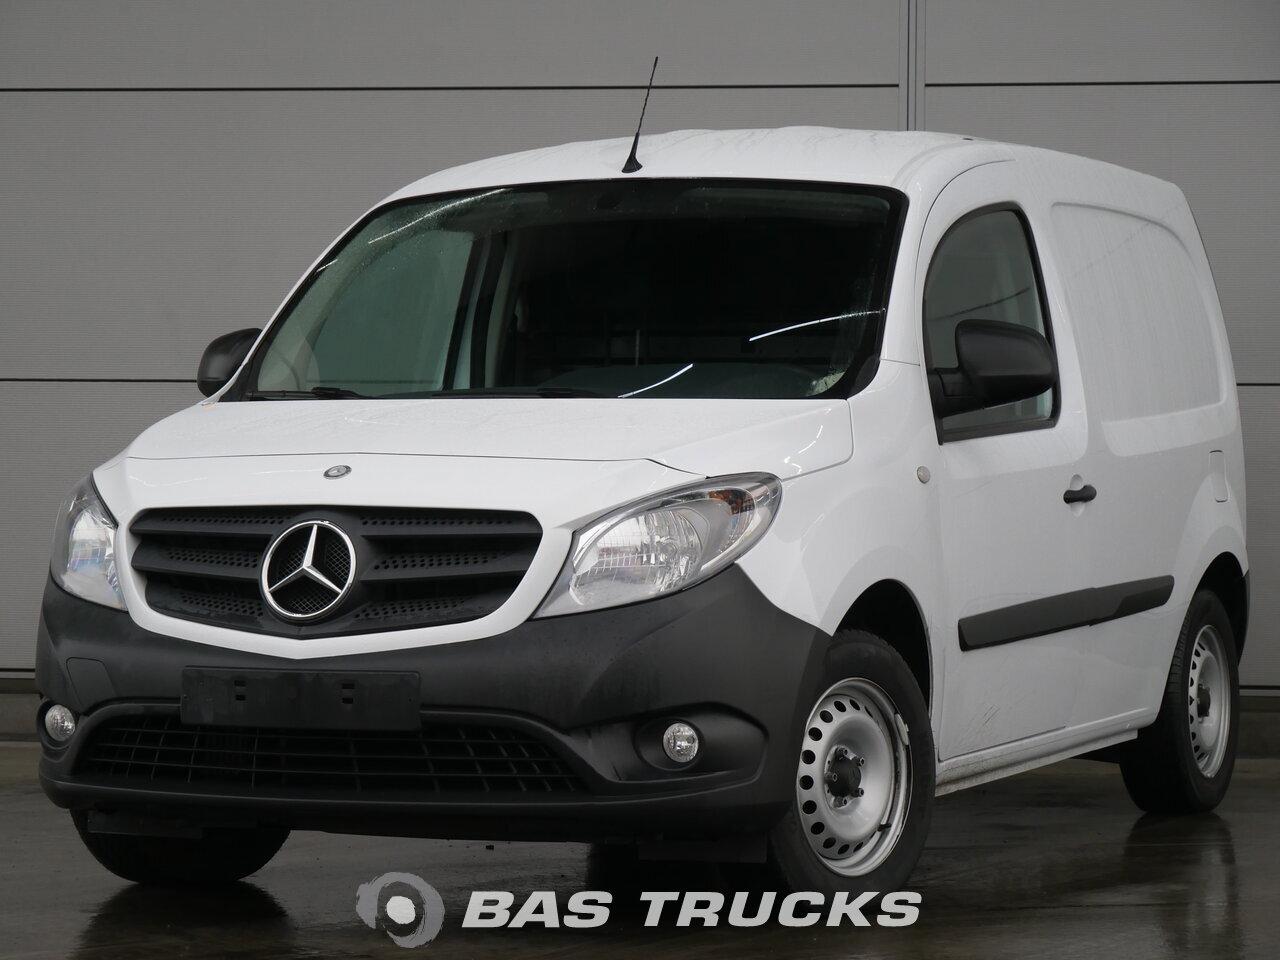 mercedes citan lcv euro 0 8400 bas trucks. Black Bedroom Furniture Sets. Home Design Ideas